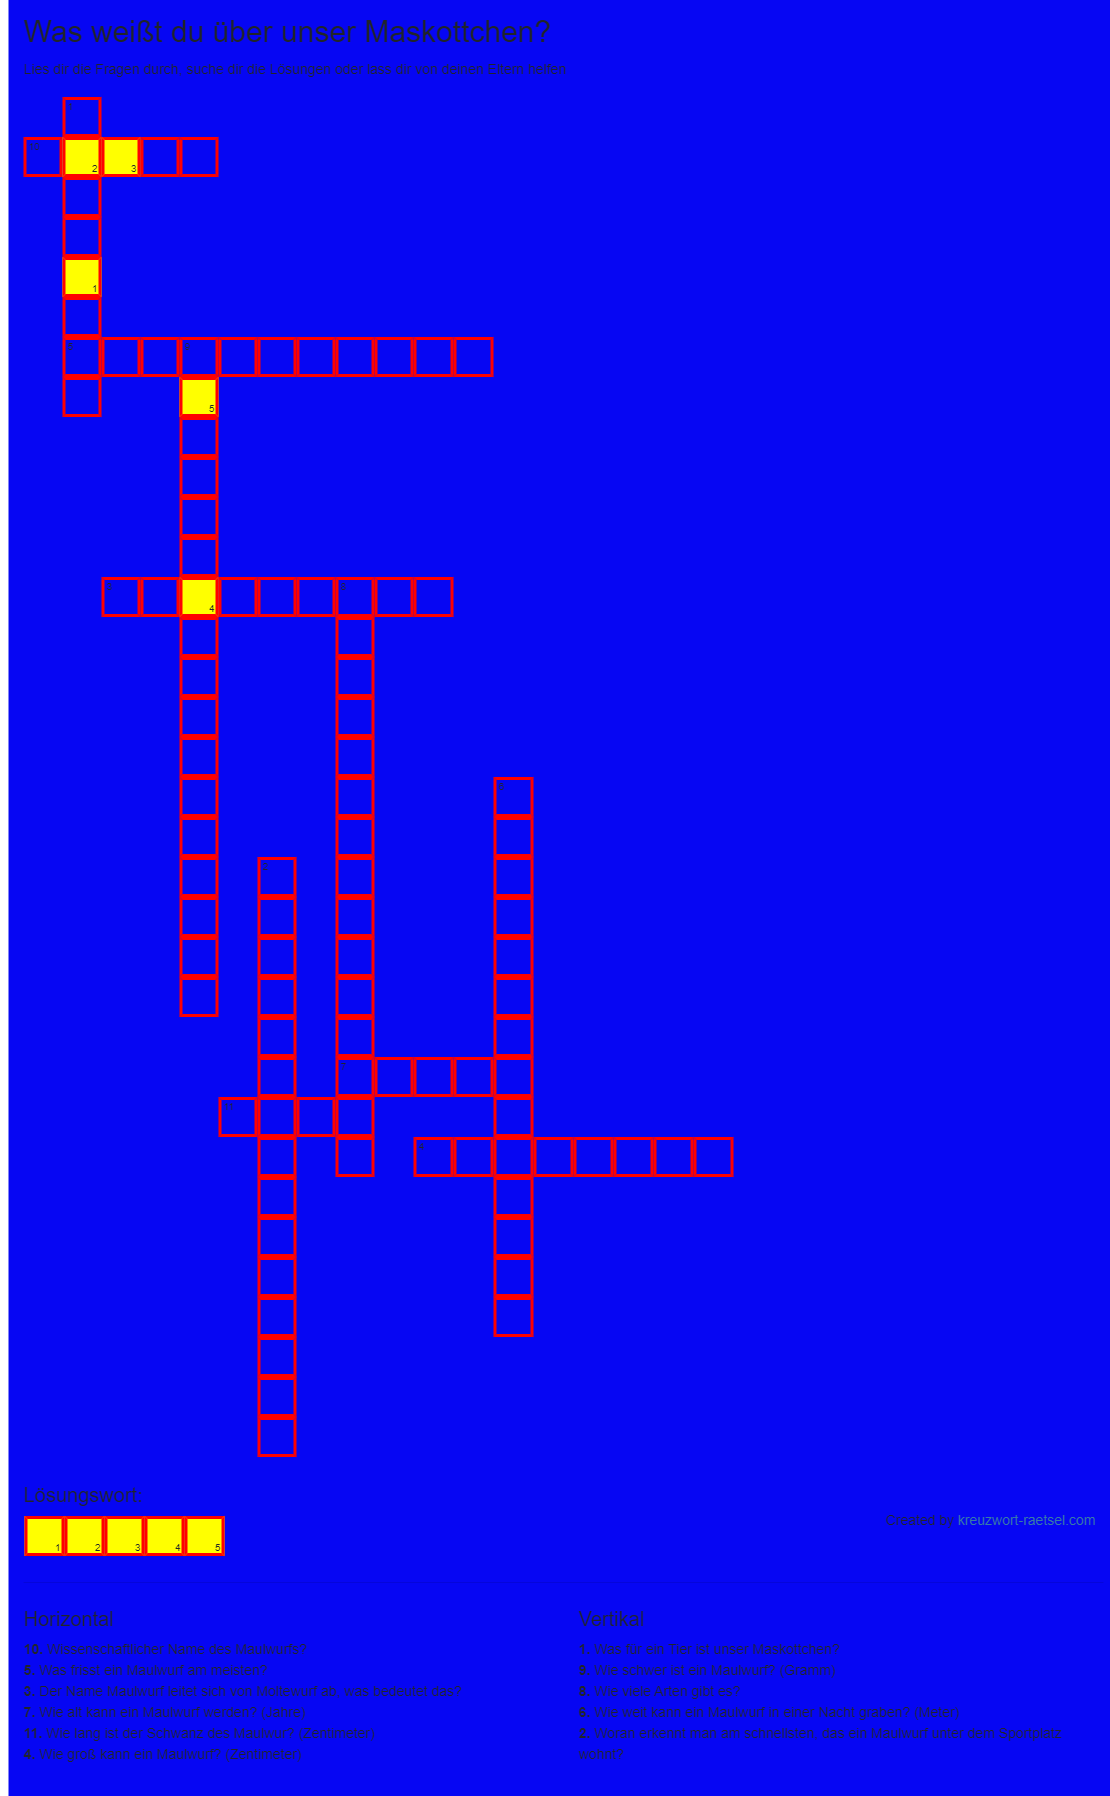 Kreuzworträtsel Online Bild